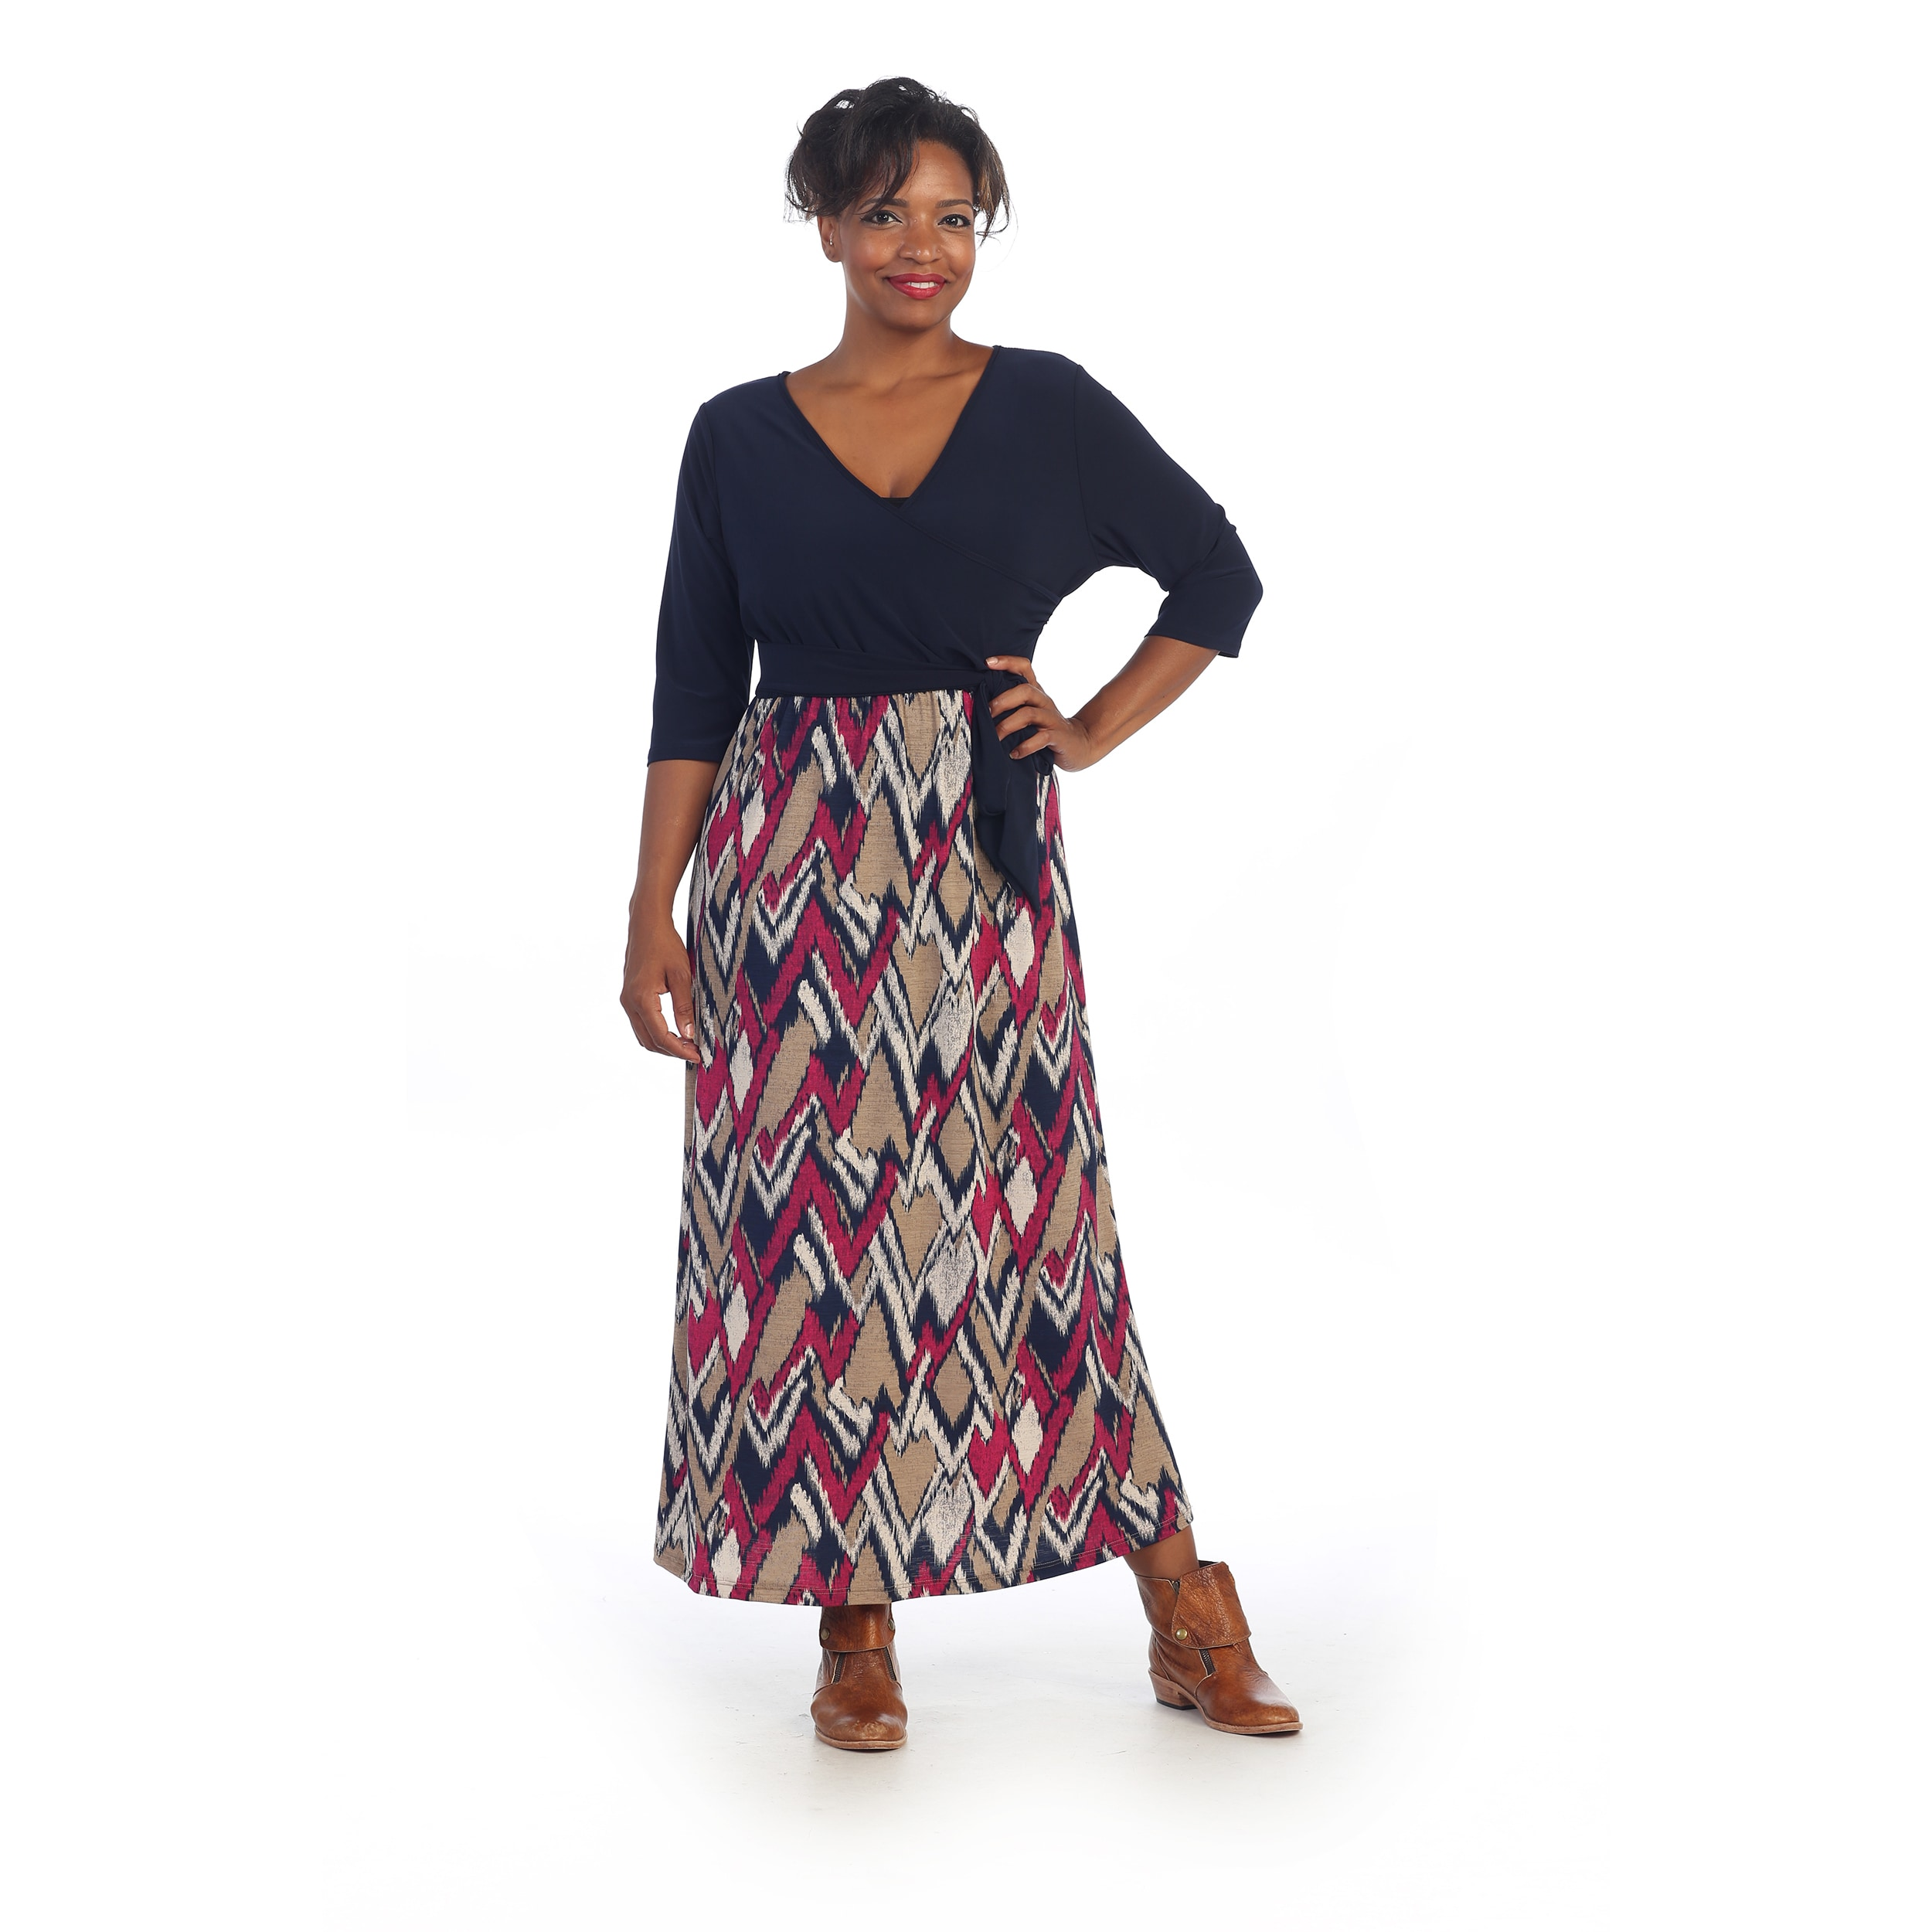 Overstock.com Hadari Women's Plus Size Maxi Dress